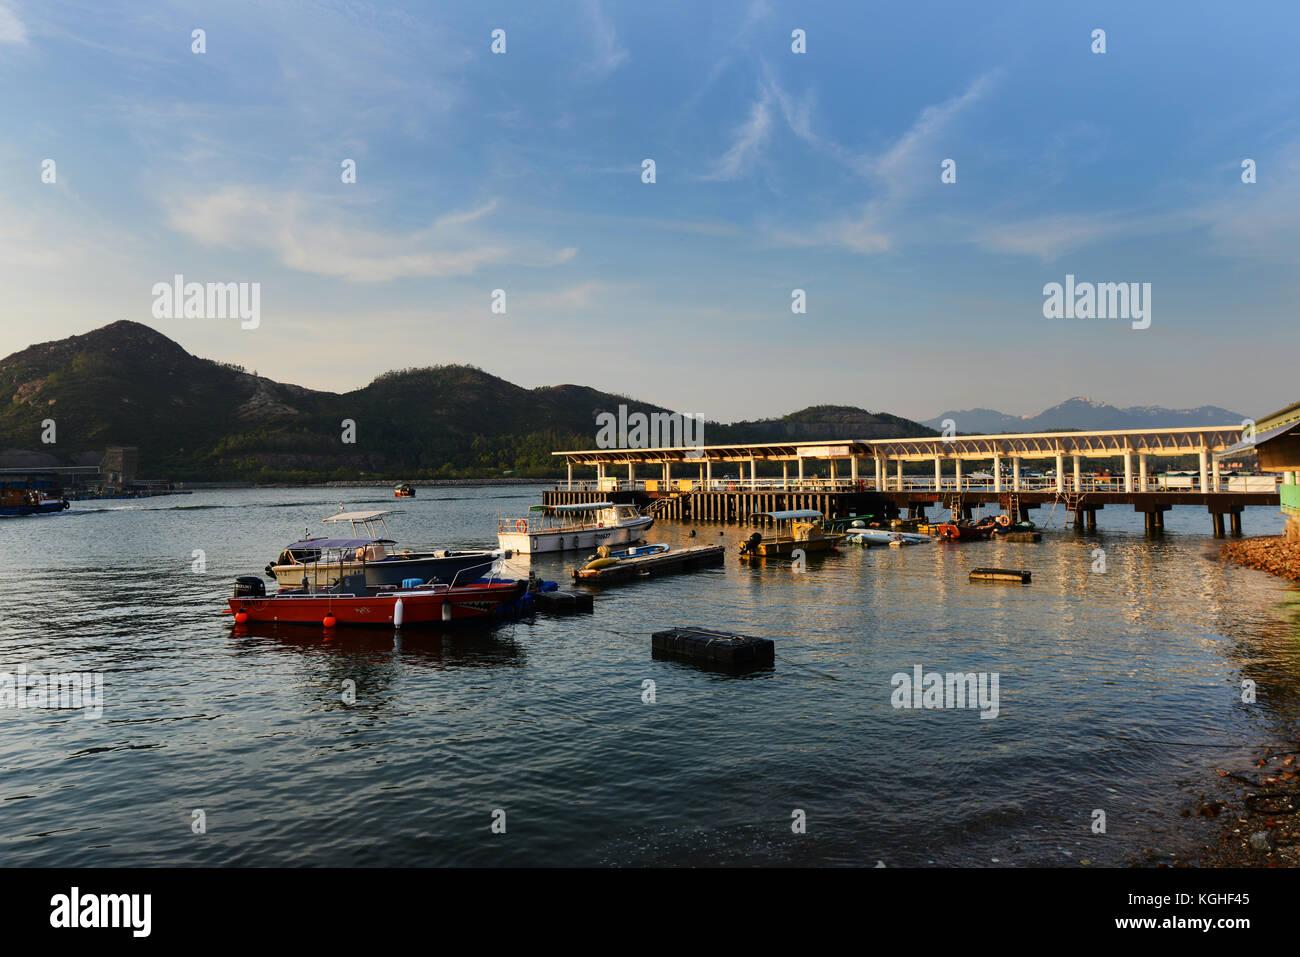 Sok Kwu Wan village on Lamma island, Hong Kong. - Stock Image